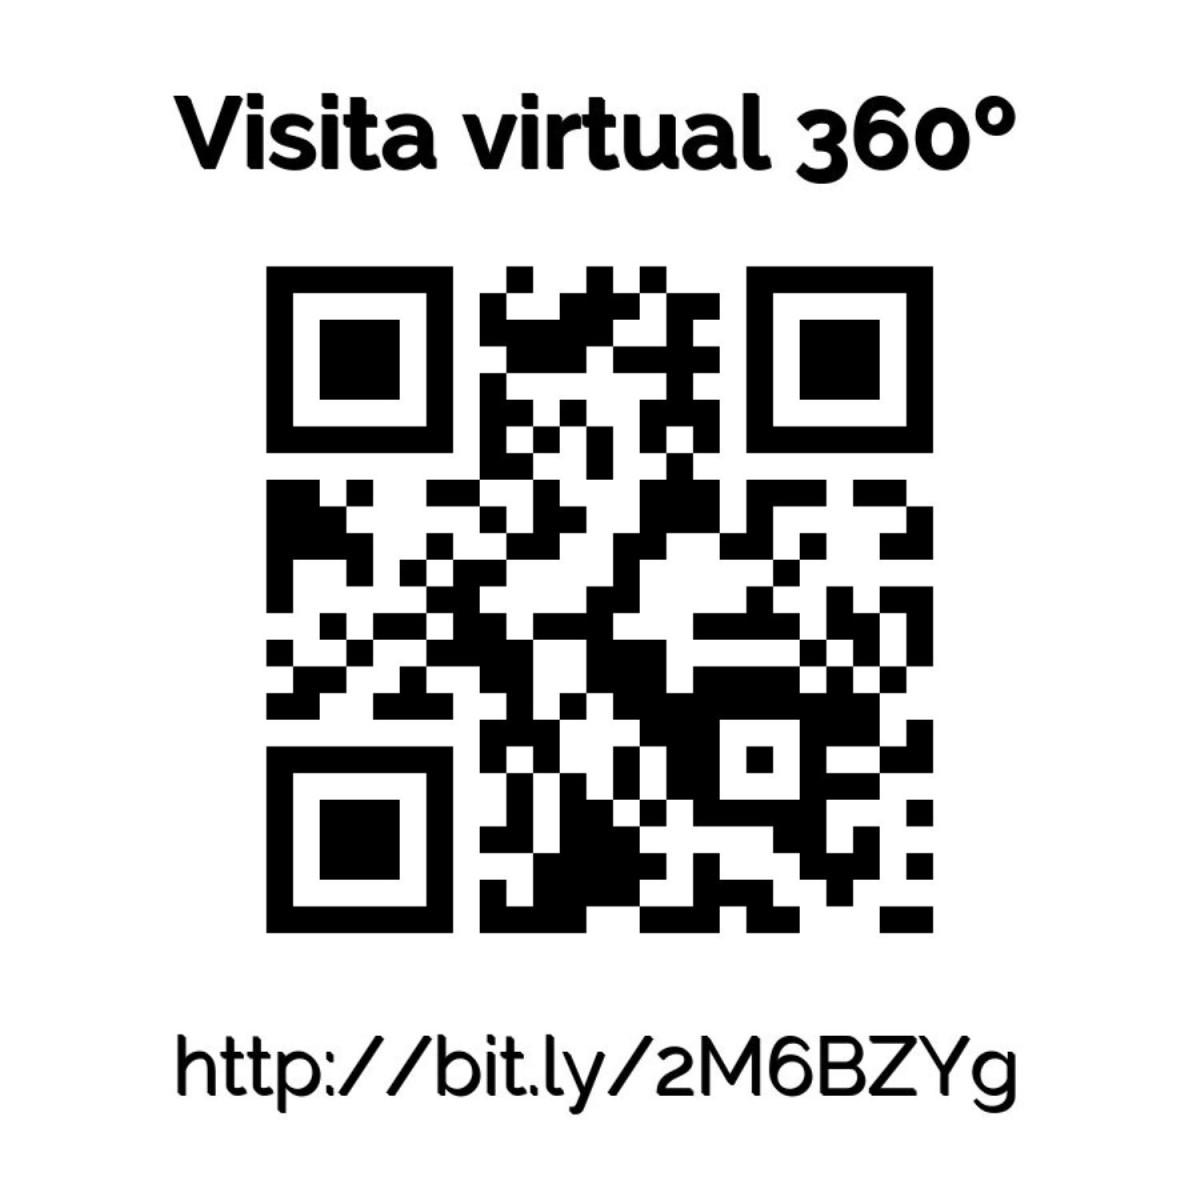 3408-03721